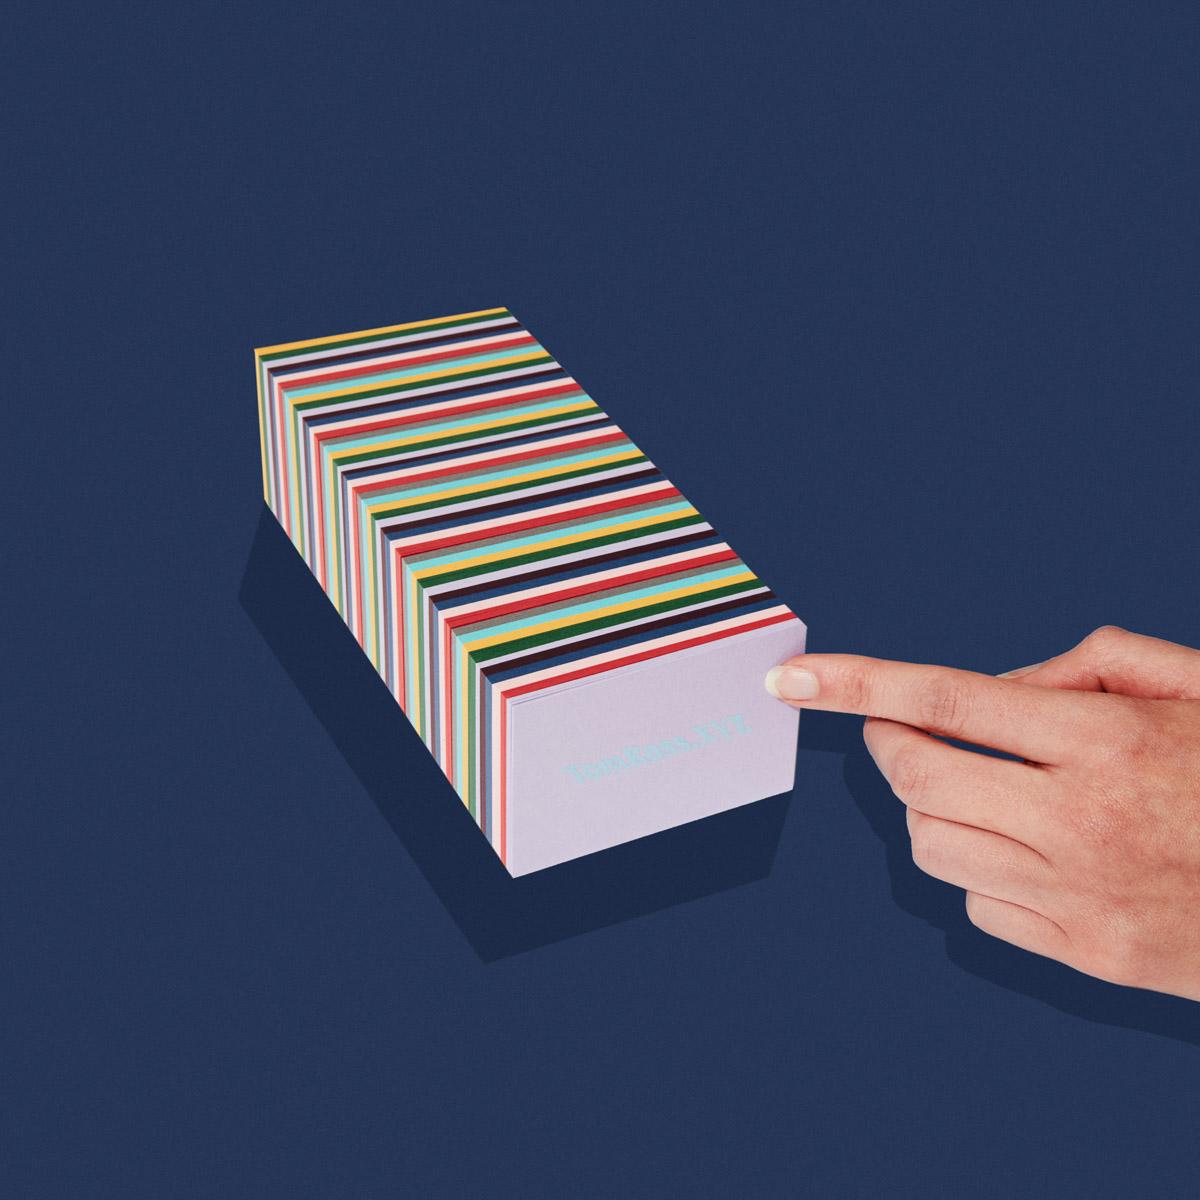 TomRoss.xyz Business Cards by Confetti Studio